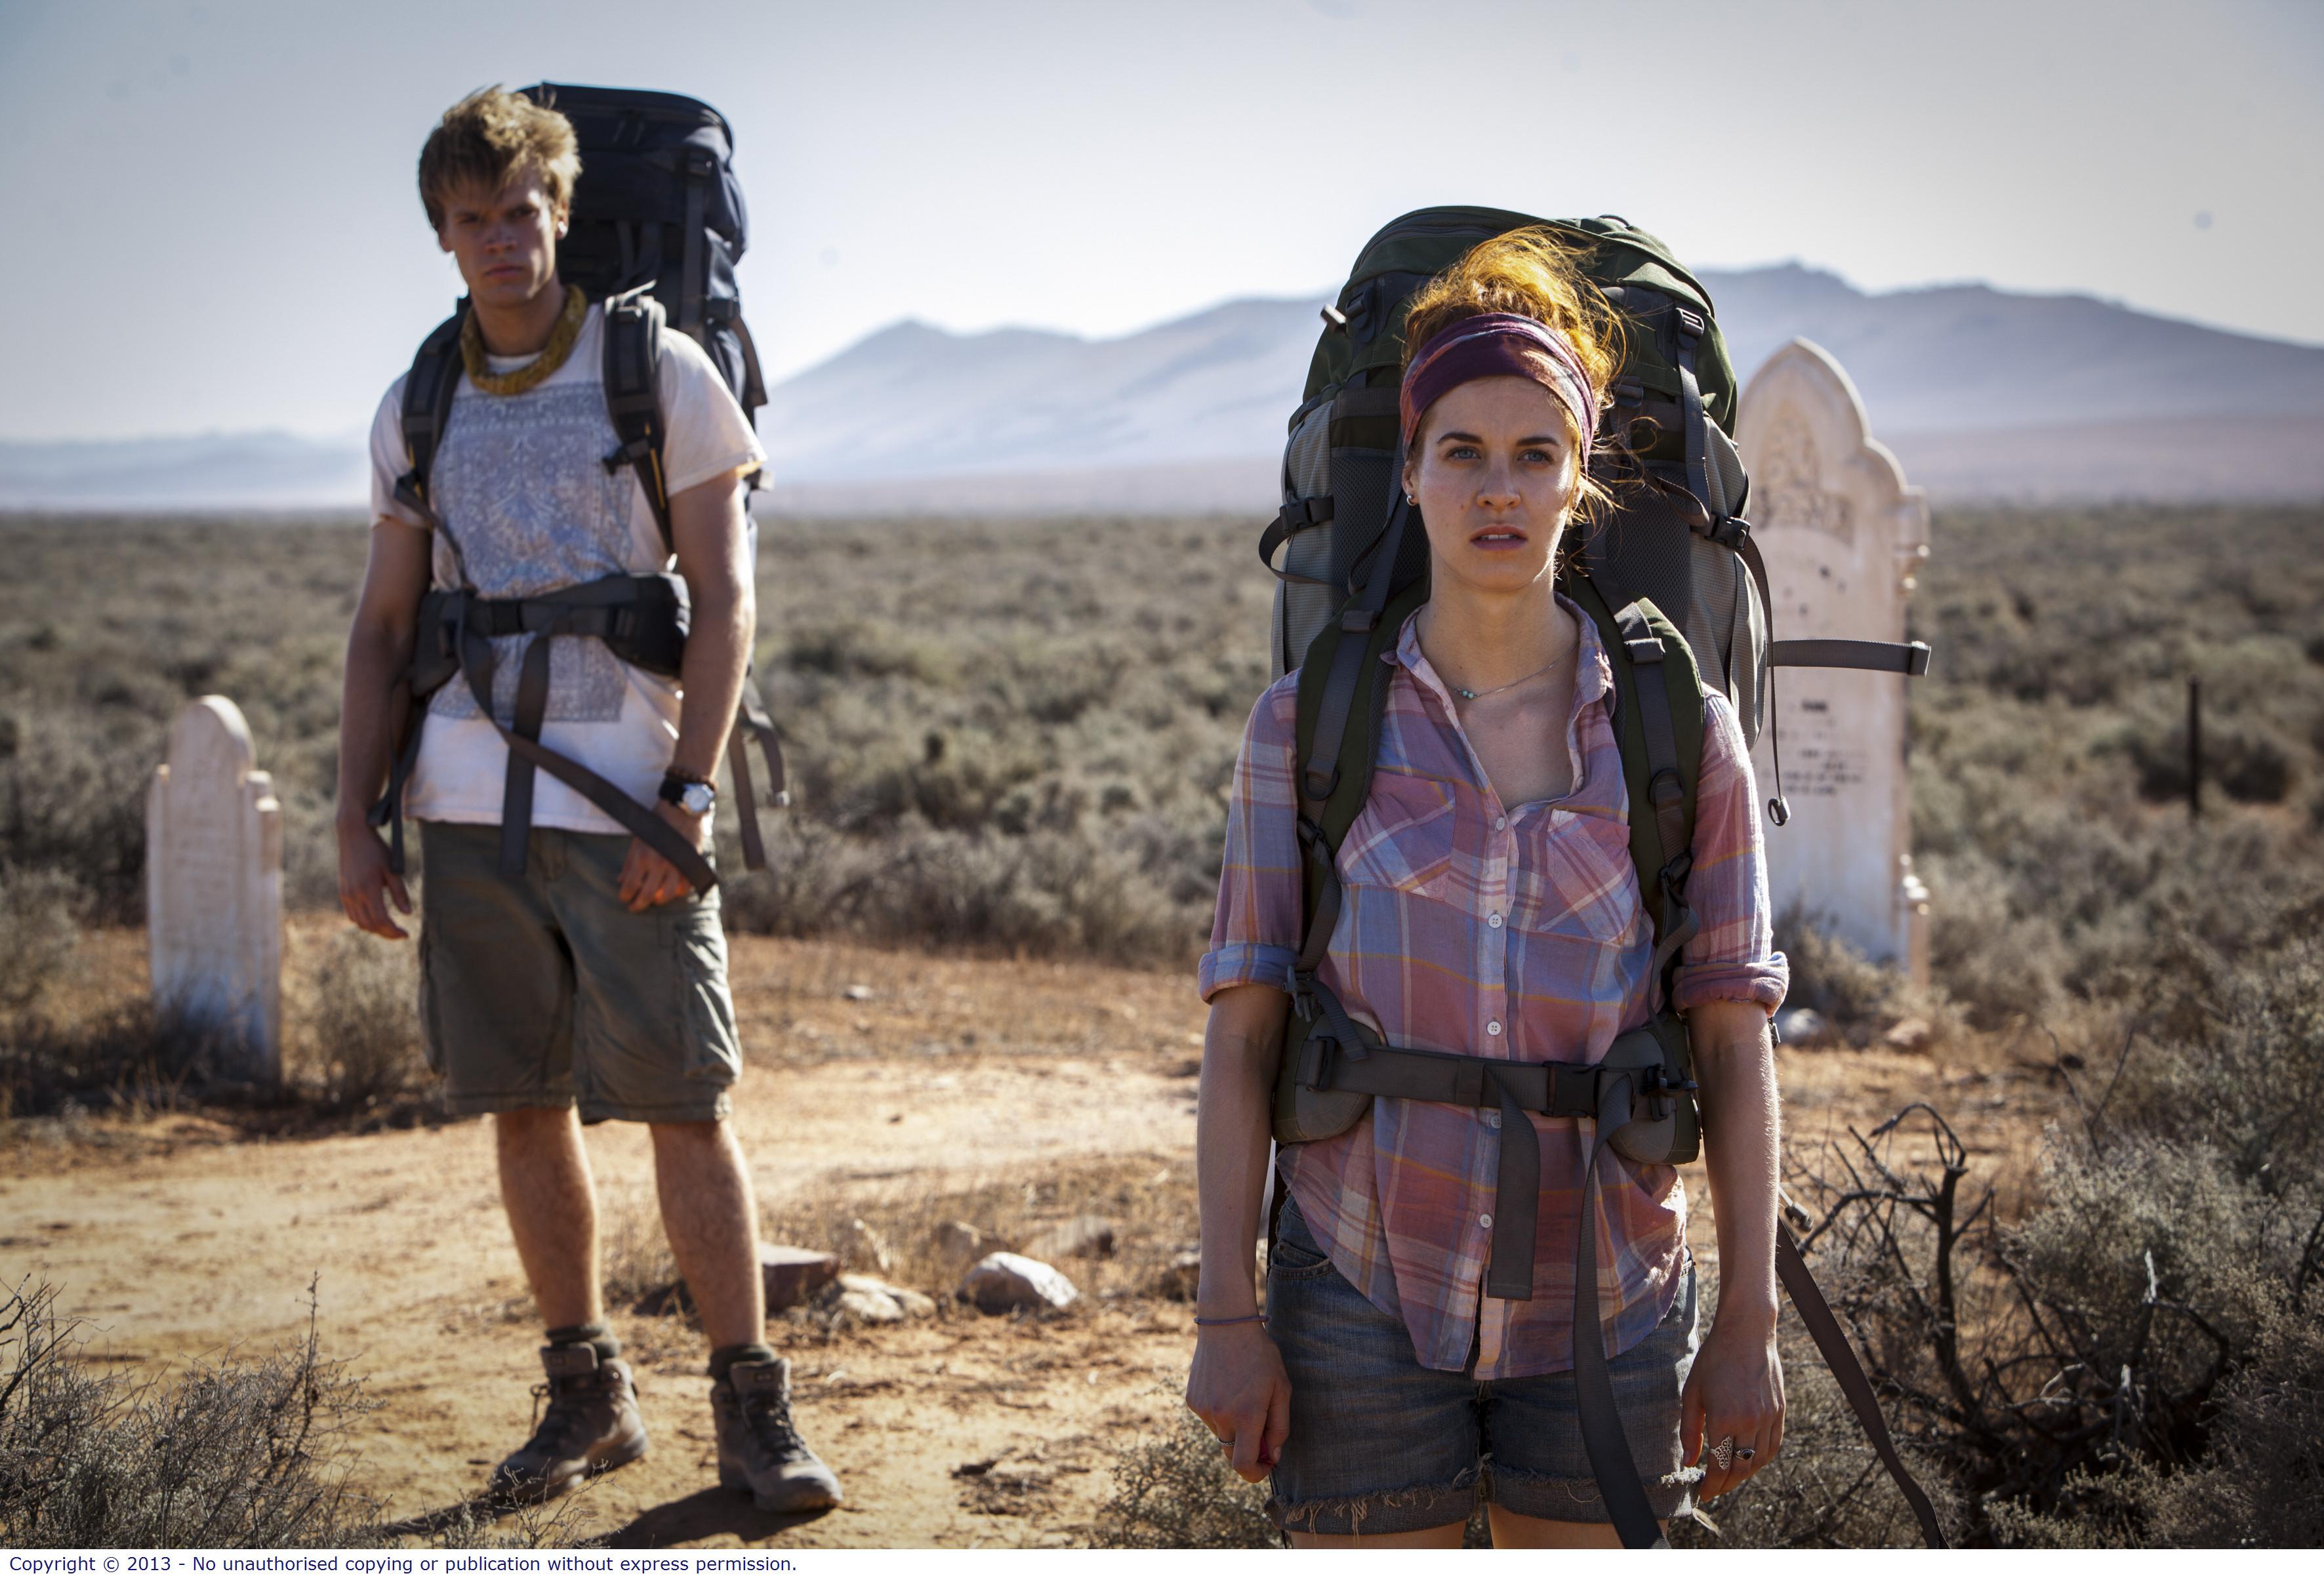 WolfCreek2_L-R Phillipe Klaus as Rutger and Shannon Ashlyn as Katarina_bush grave